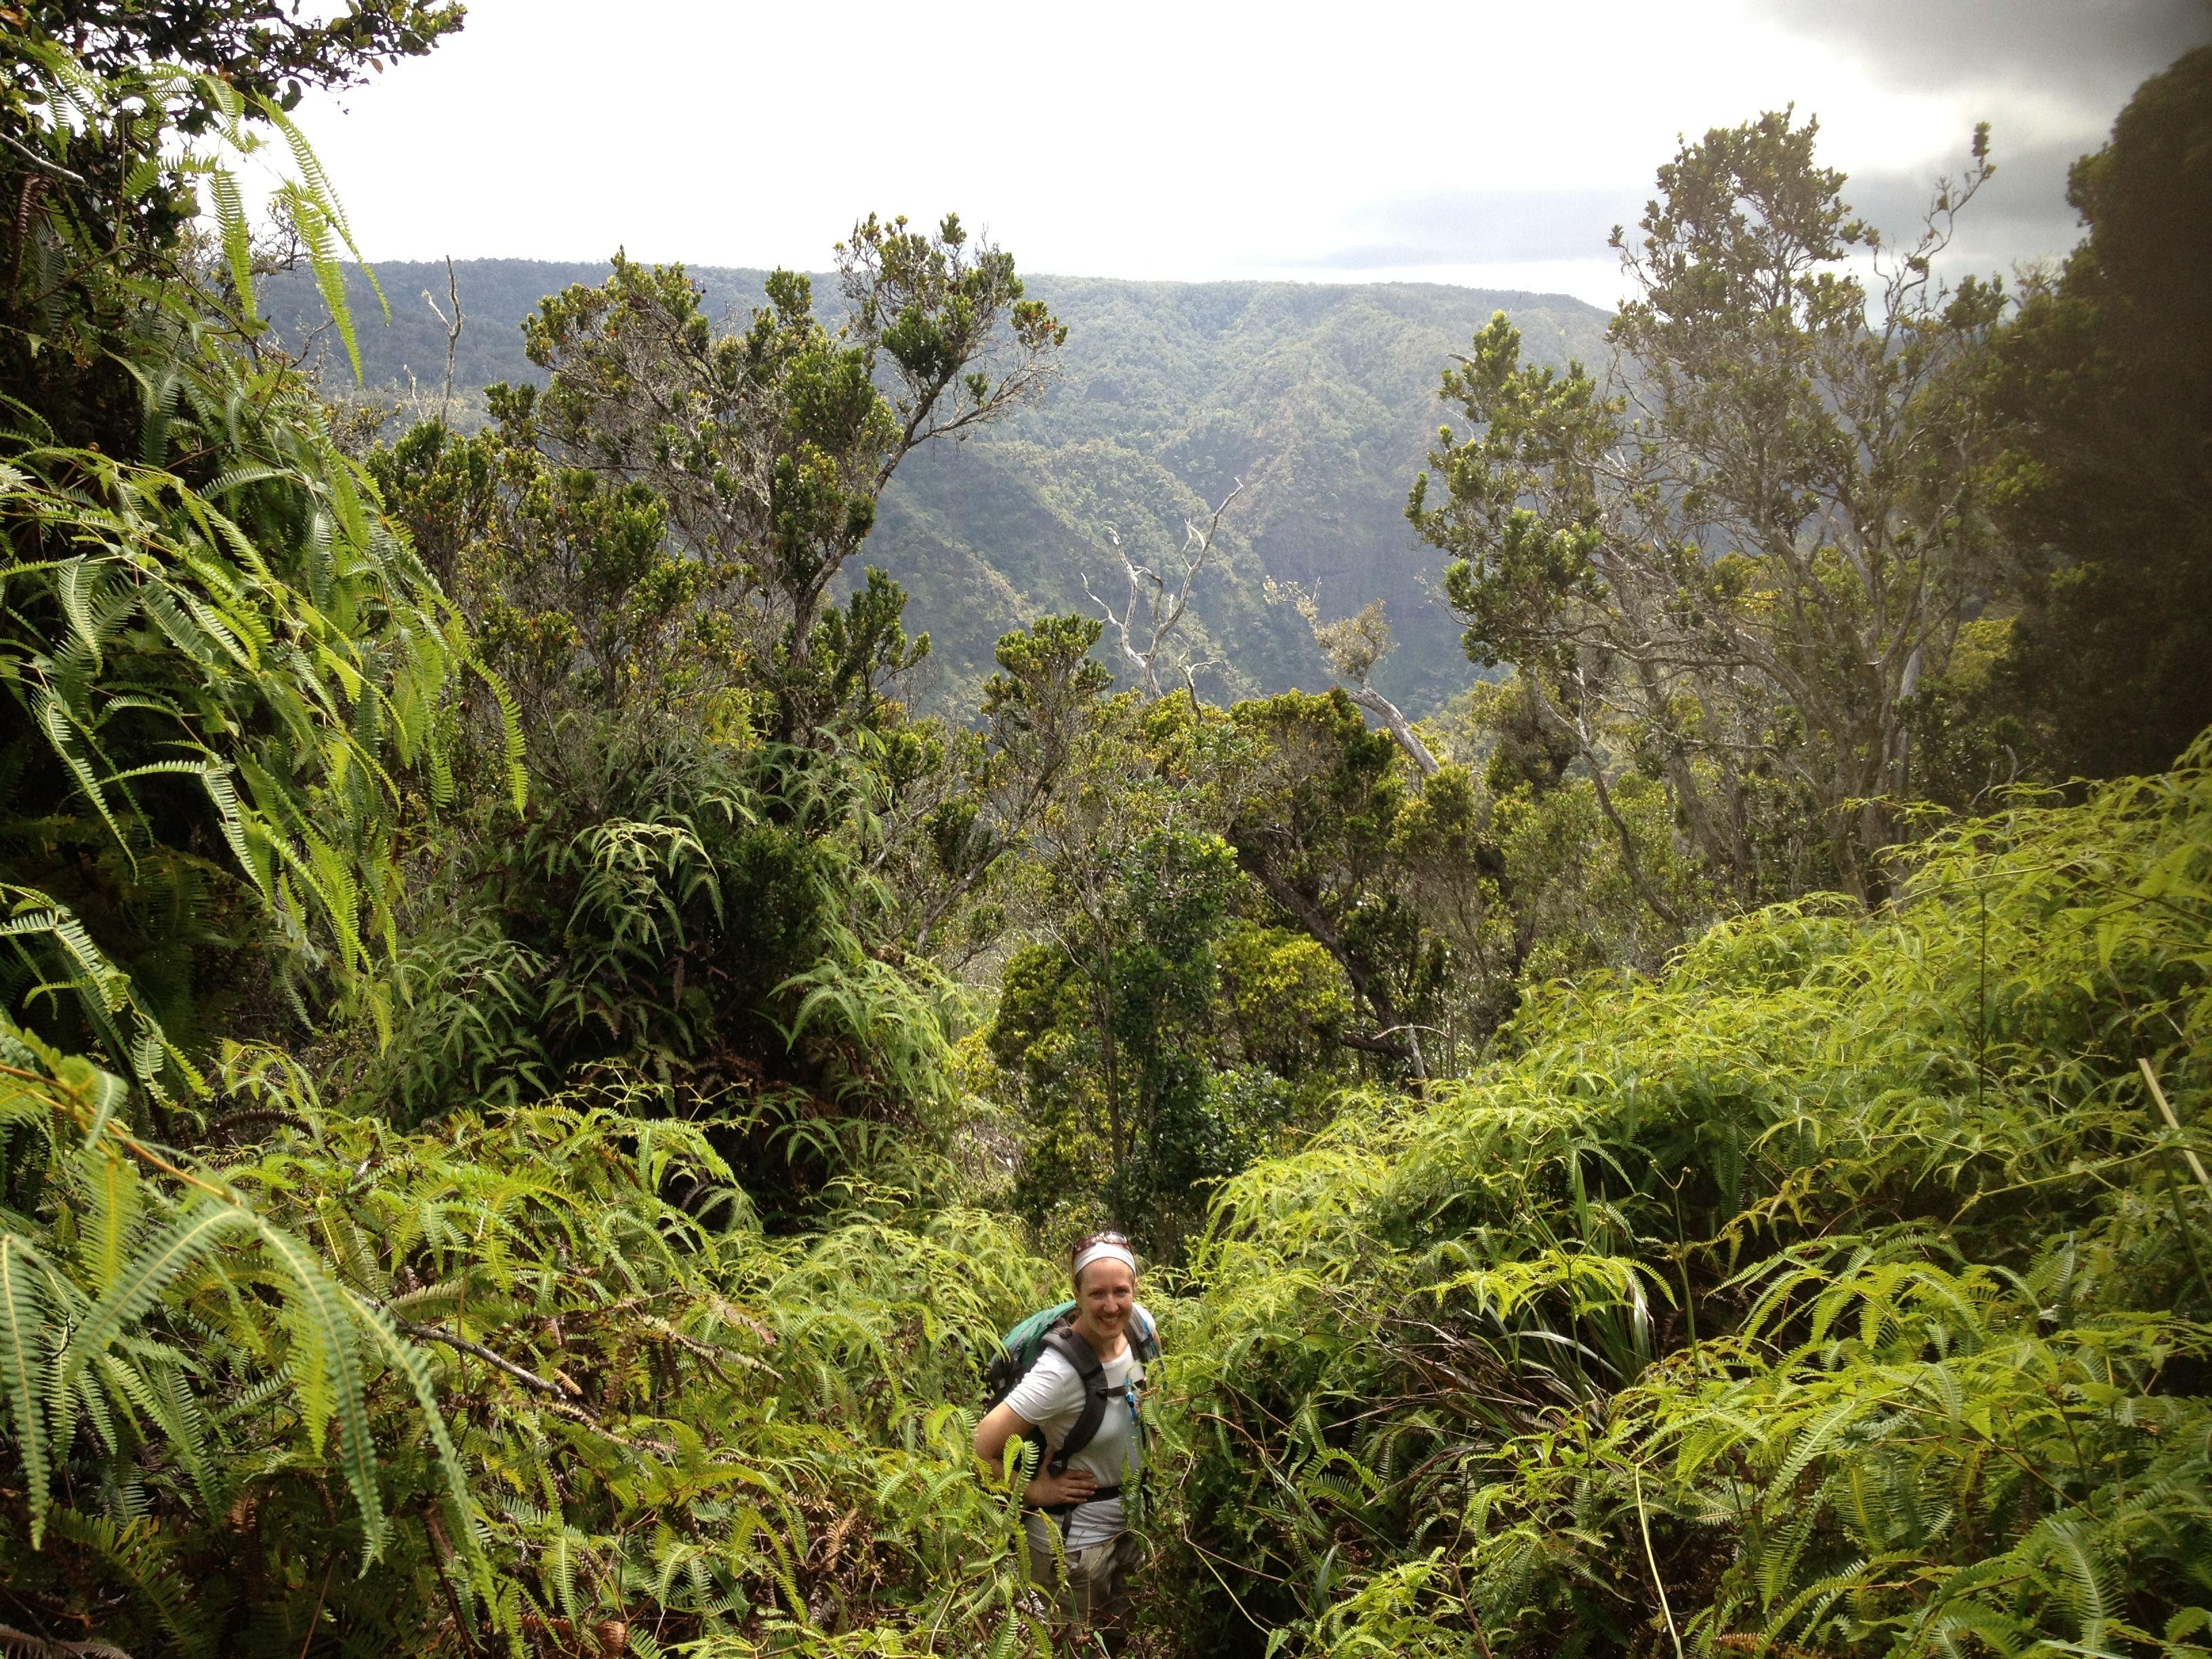 Hiking The Rainforests Of The Mohihi Waialae Trail In Wiamea Canyon Waimea Canyon Kauai Scenery